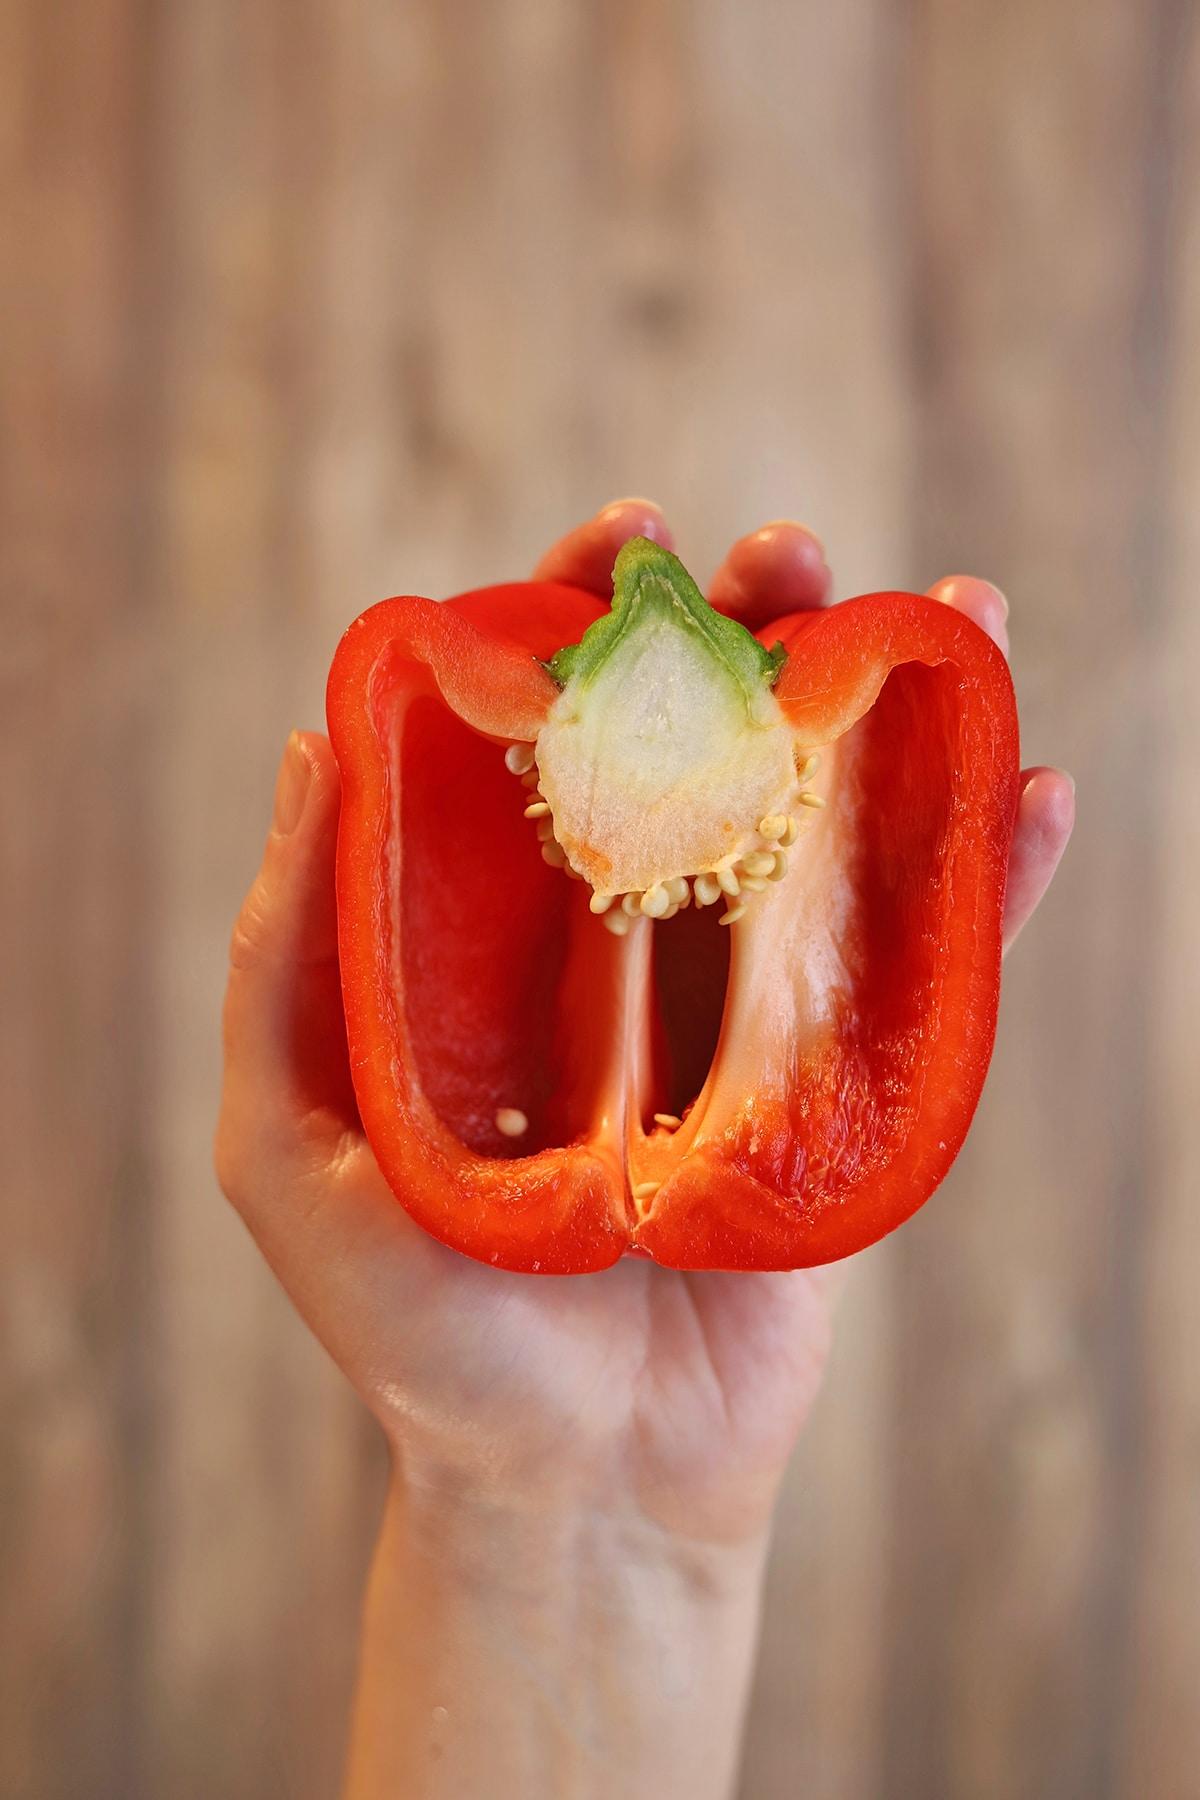 Hand holding bell pepper half over table.